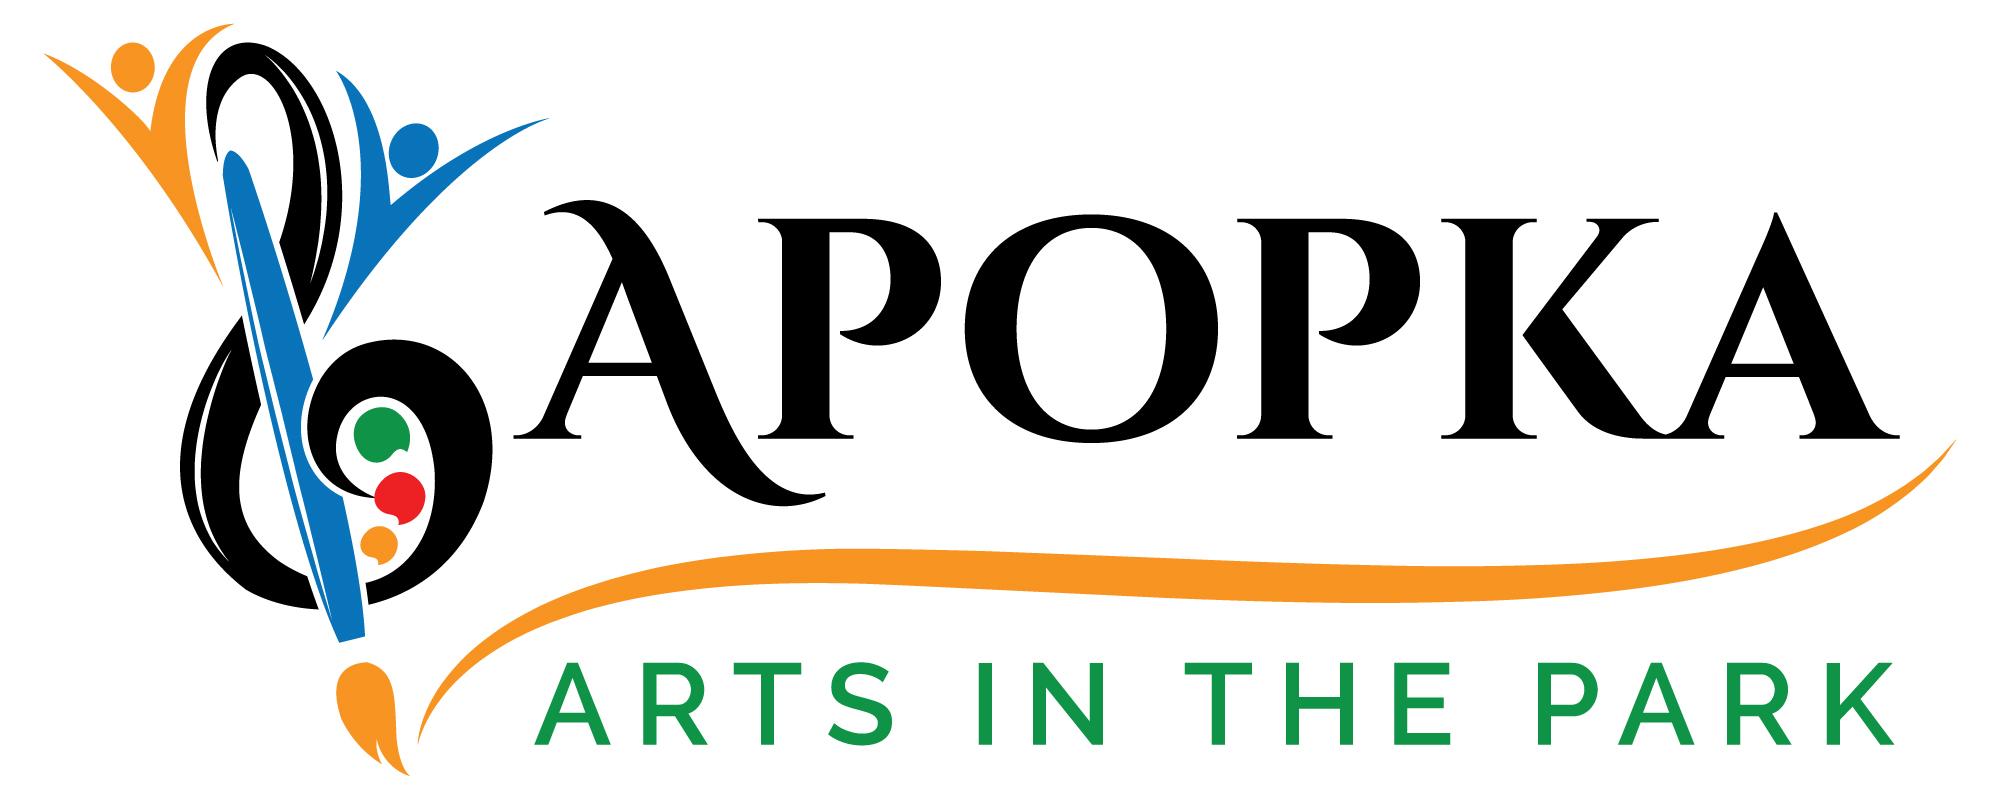 Celebrate the Arts in Apopka. December 4 and 5, 2021